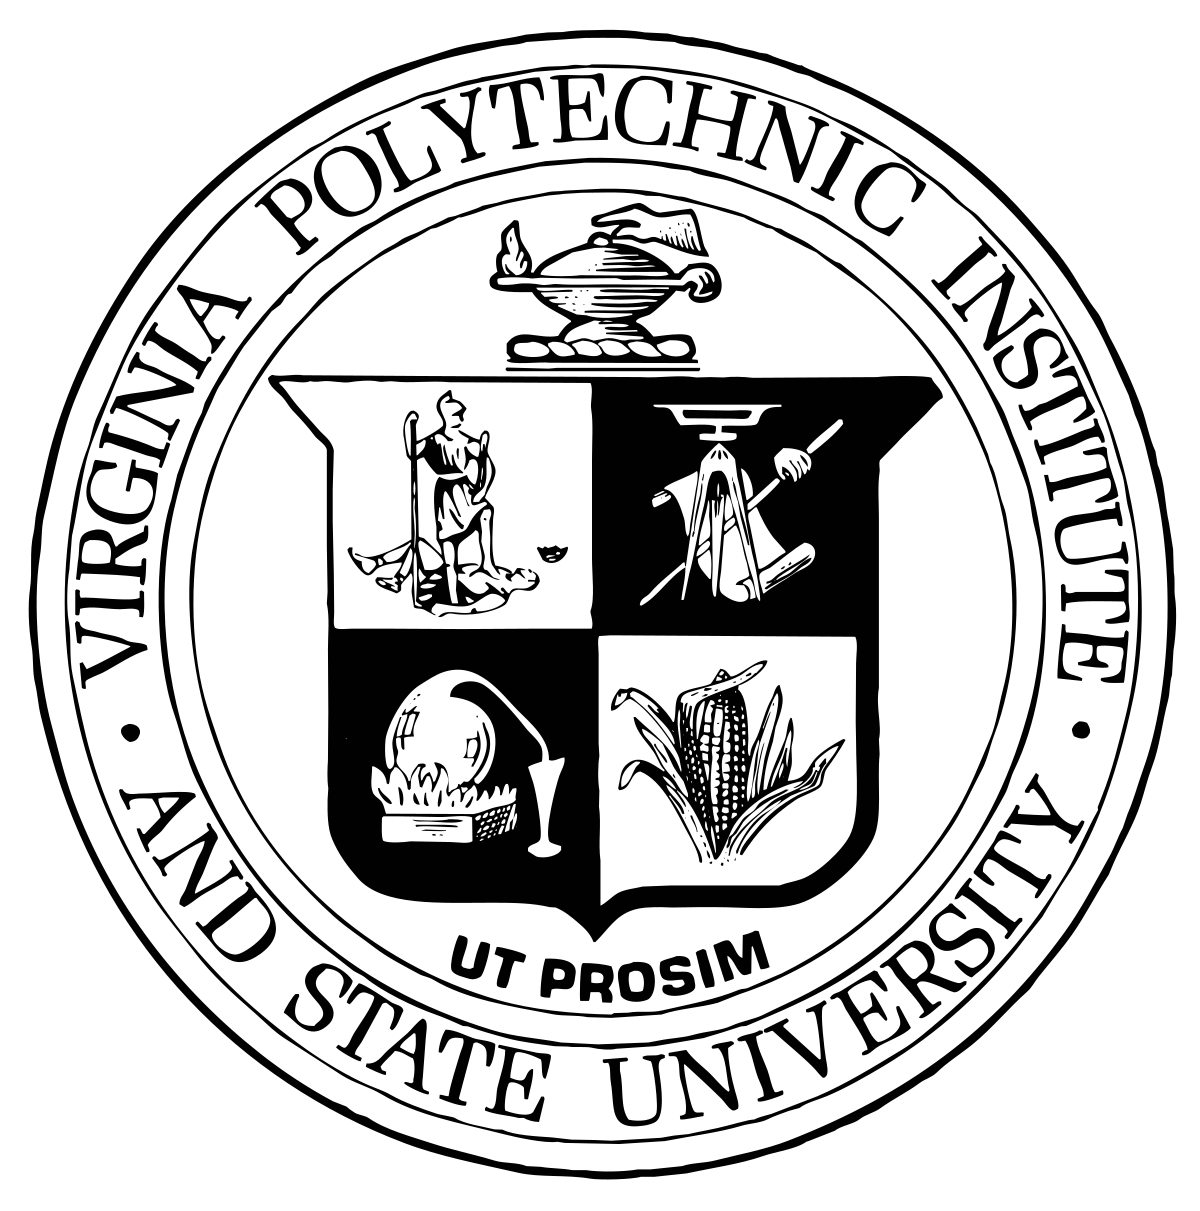 Virginia Tech Wikipedia Virginia tech, University logo